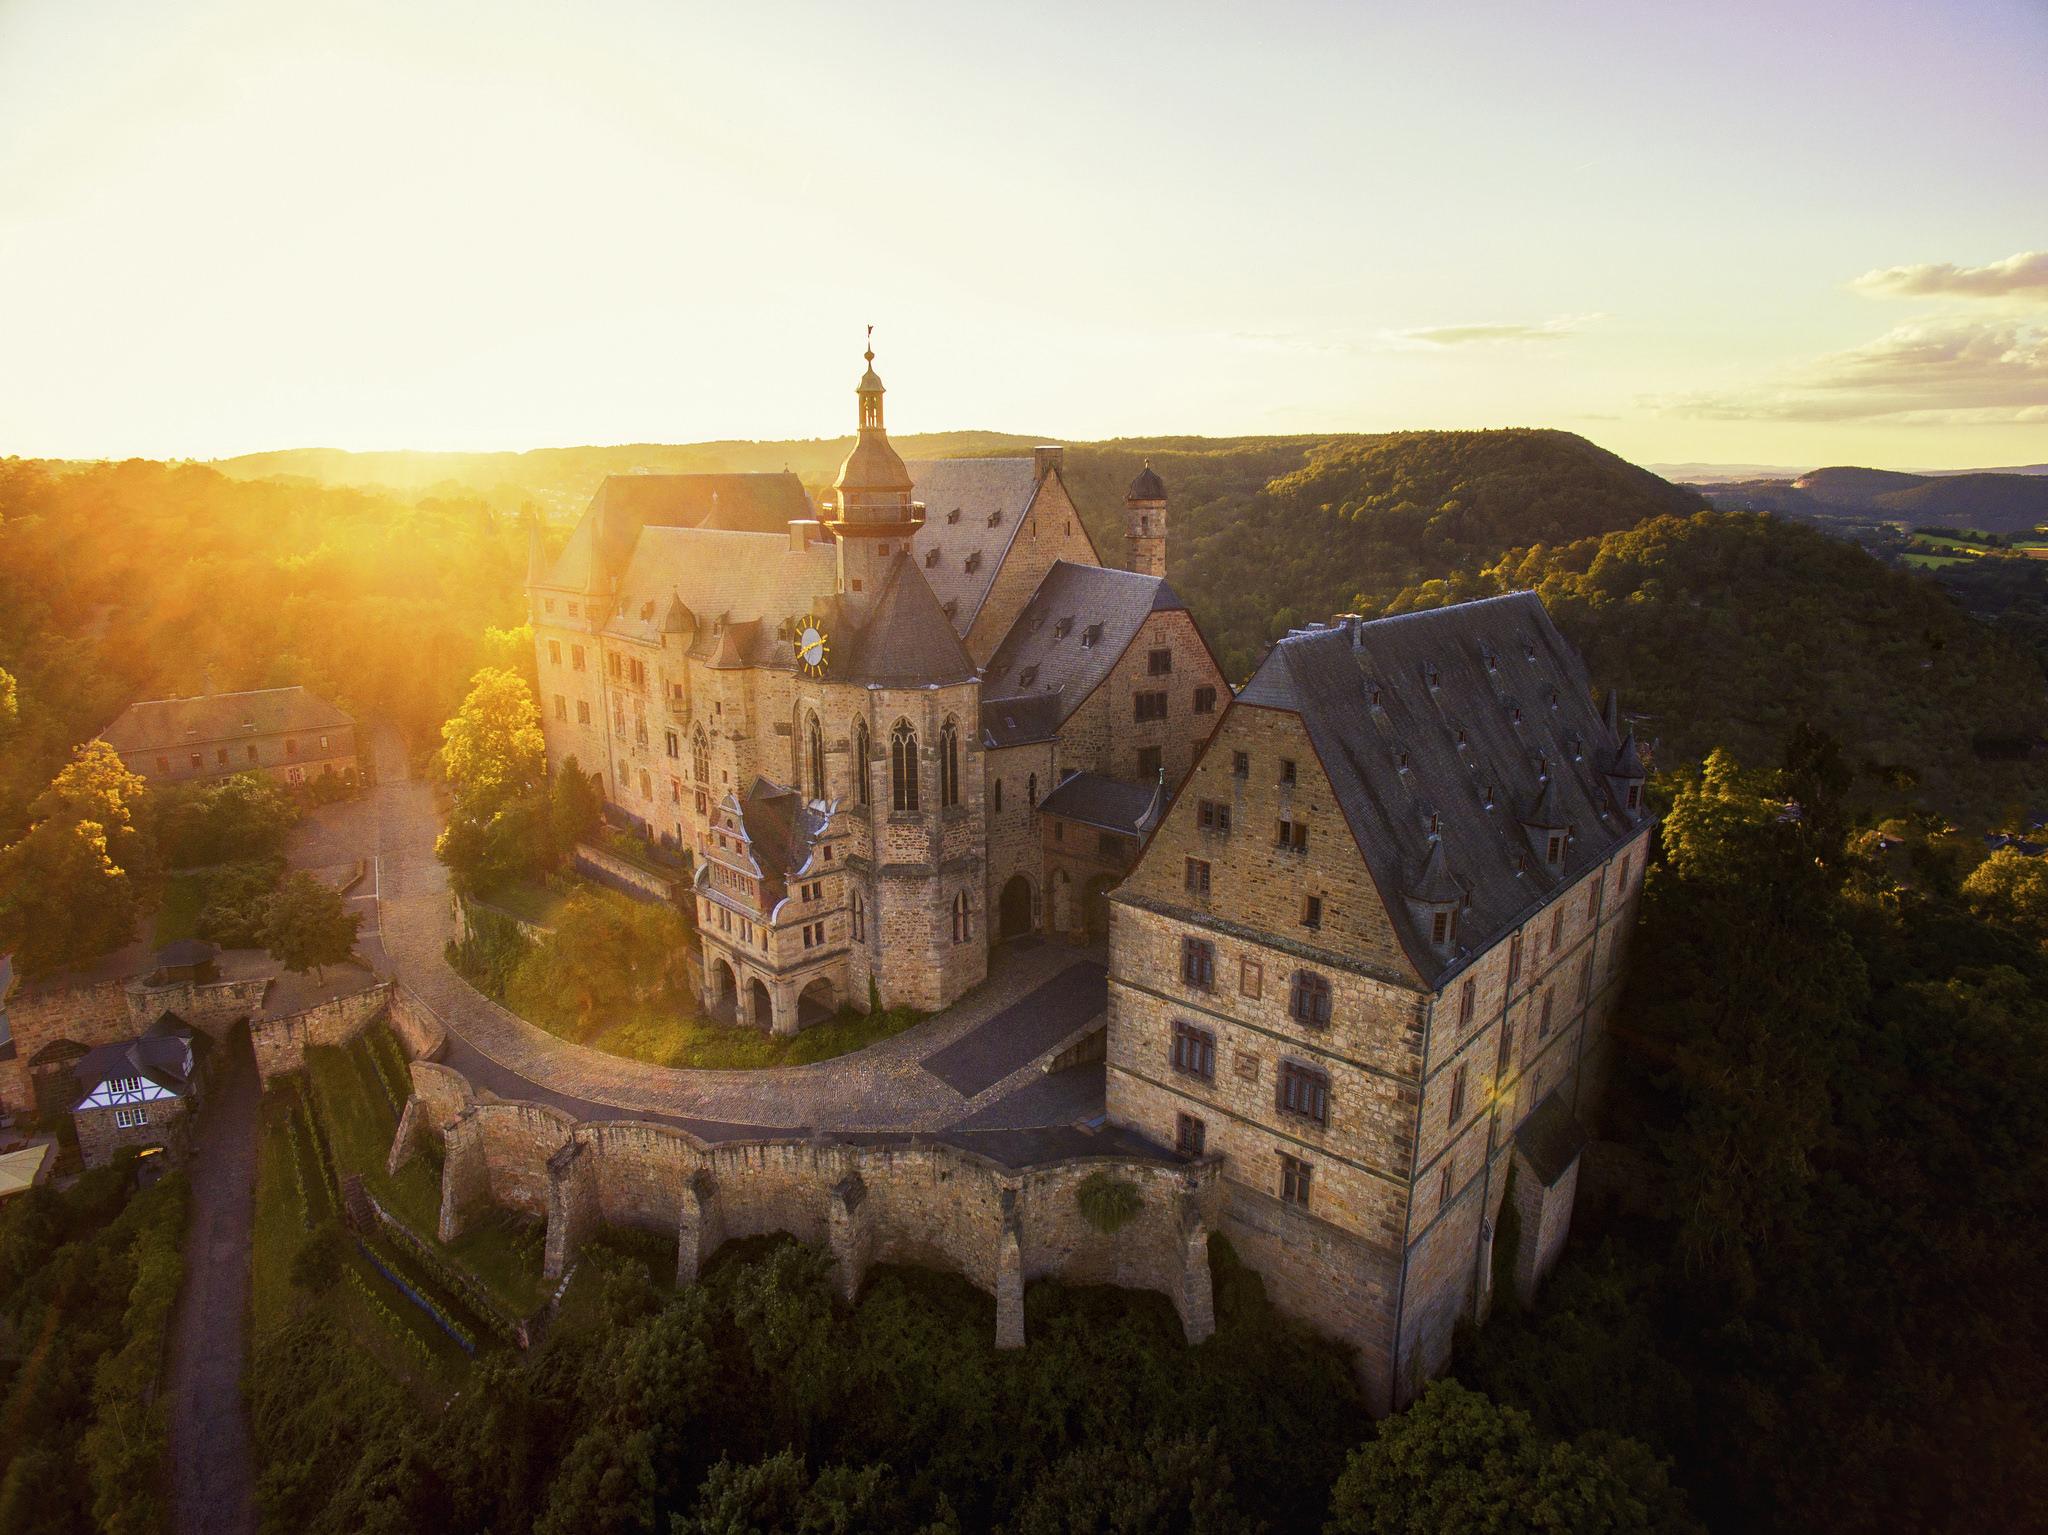 Landschaftsfotografie fotograf filmemacher frankfurt patrick schmetzer drohne landschaft natur 19